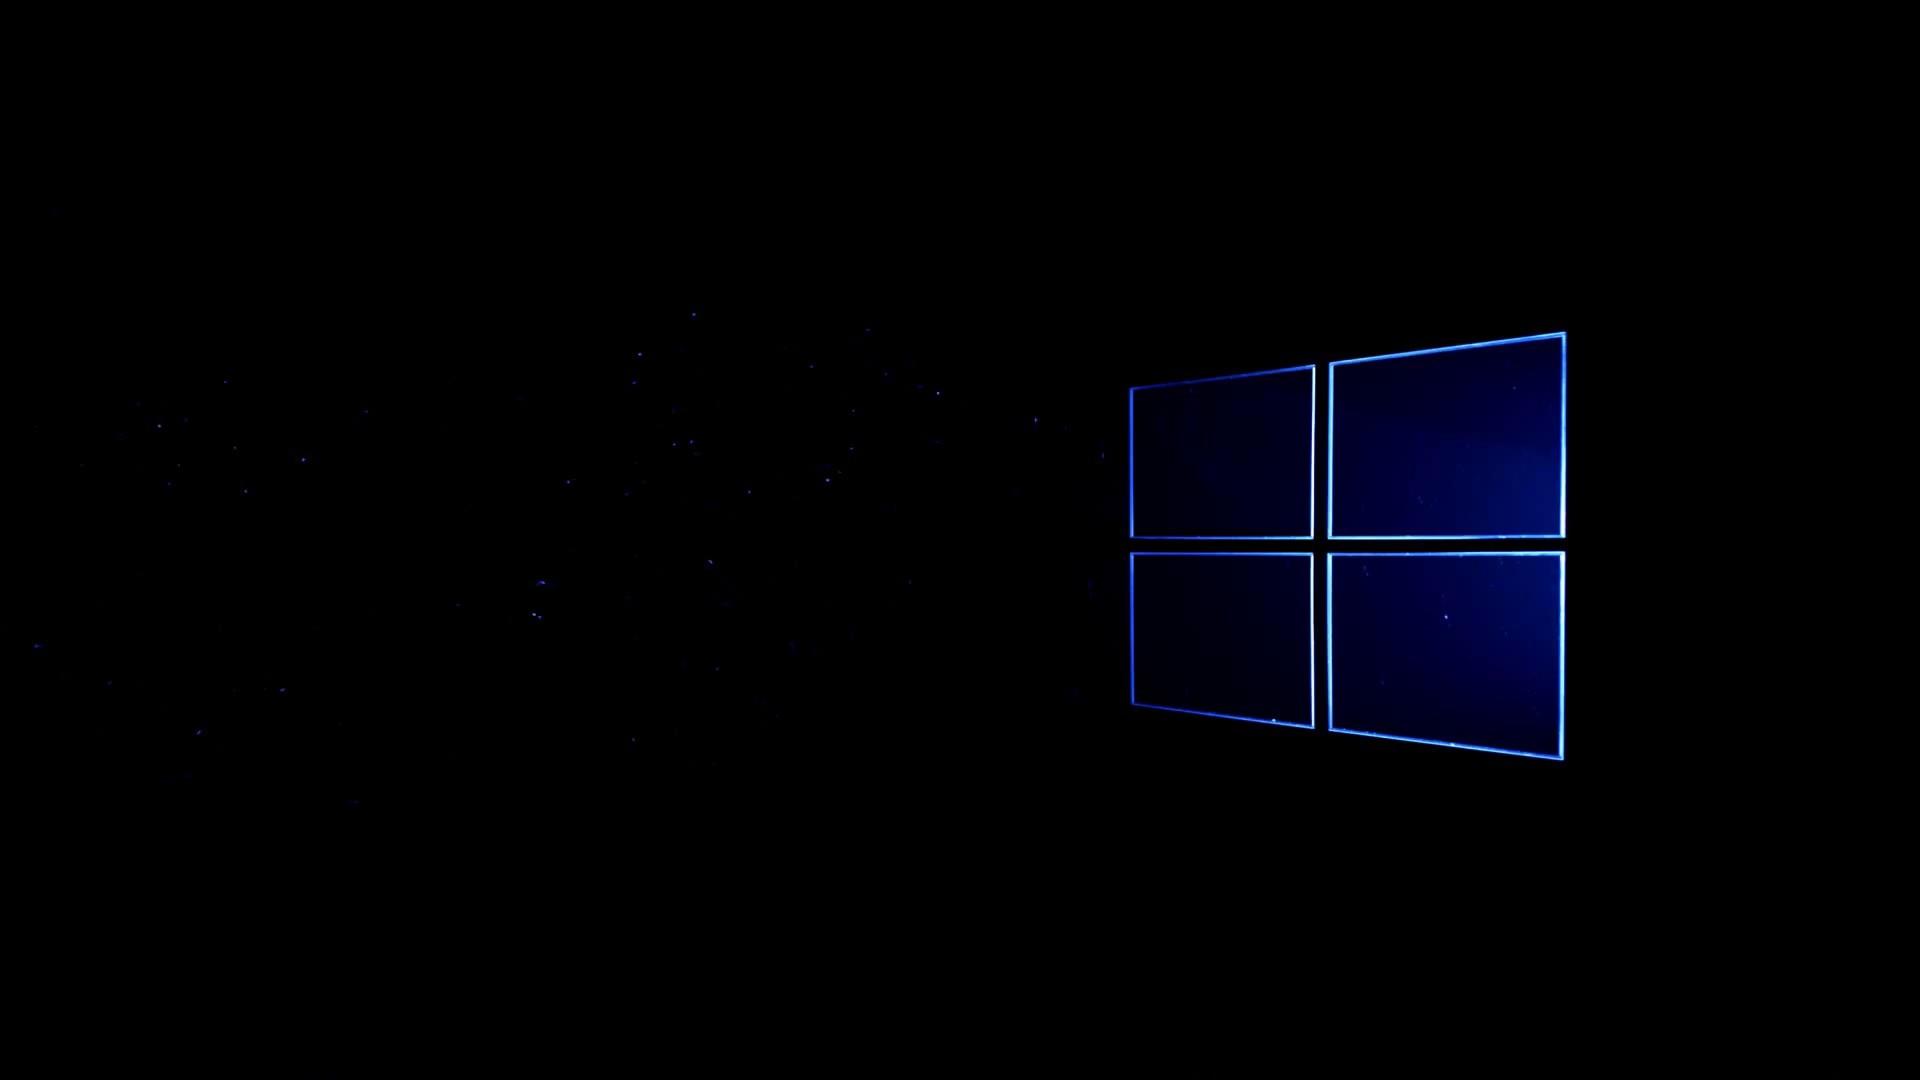 New Windows 10 Wallpaper